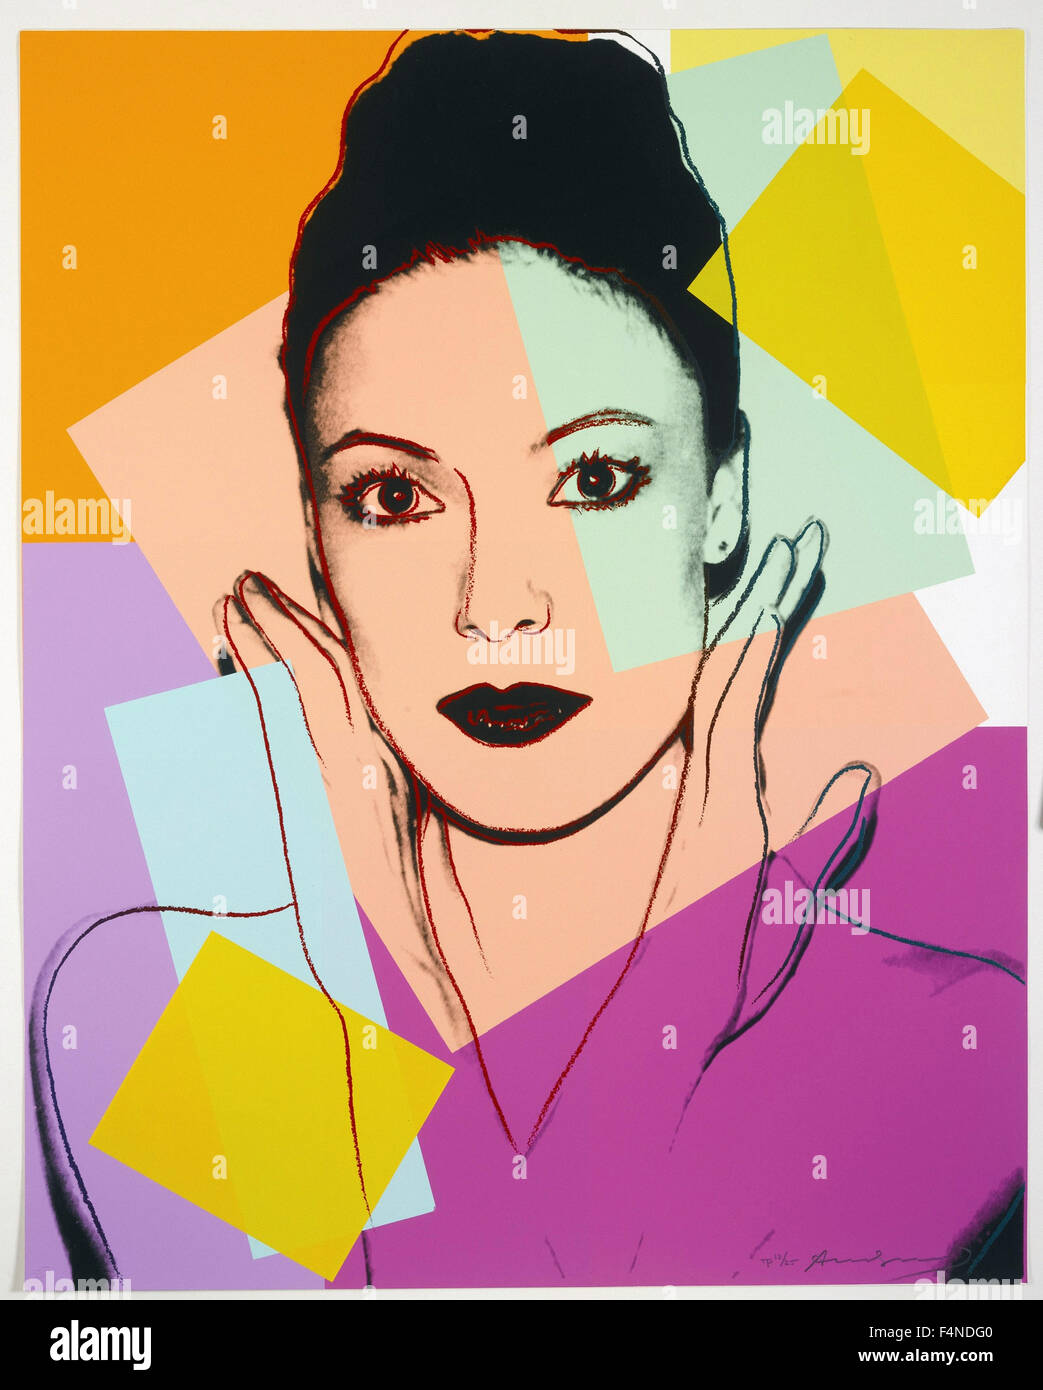 Andy Warhol - Karen Kain - Stock Image